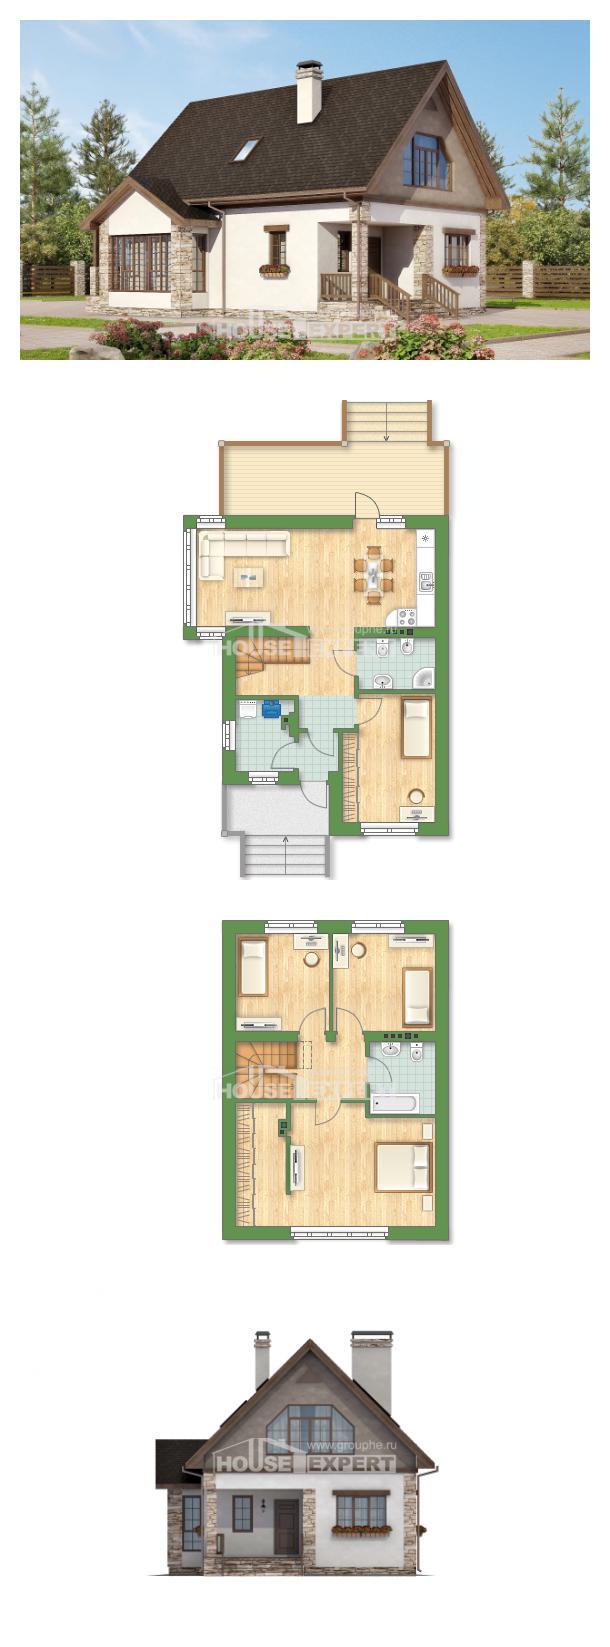 Проект дома 140-002-Л   House Expert